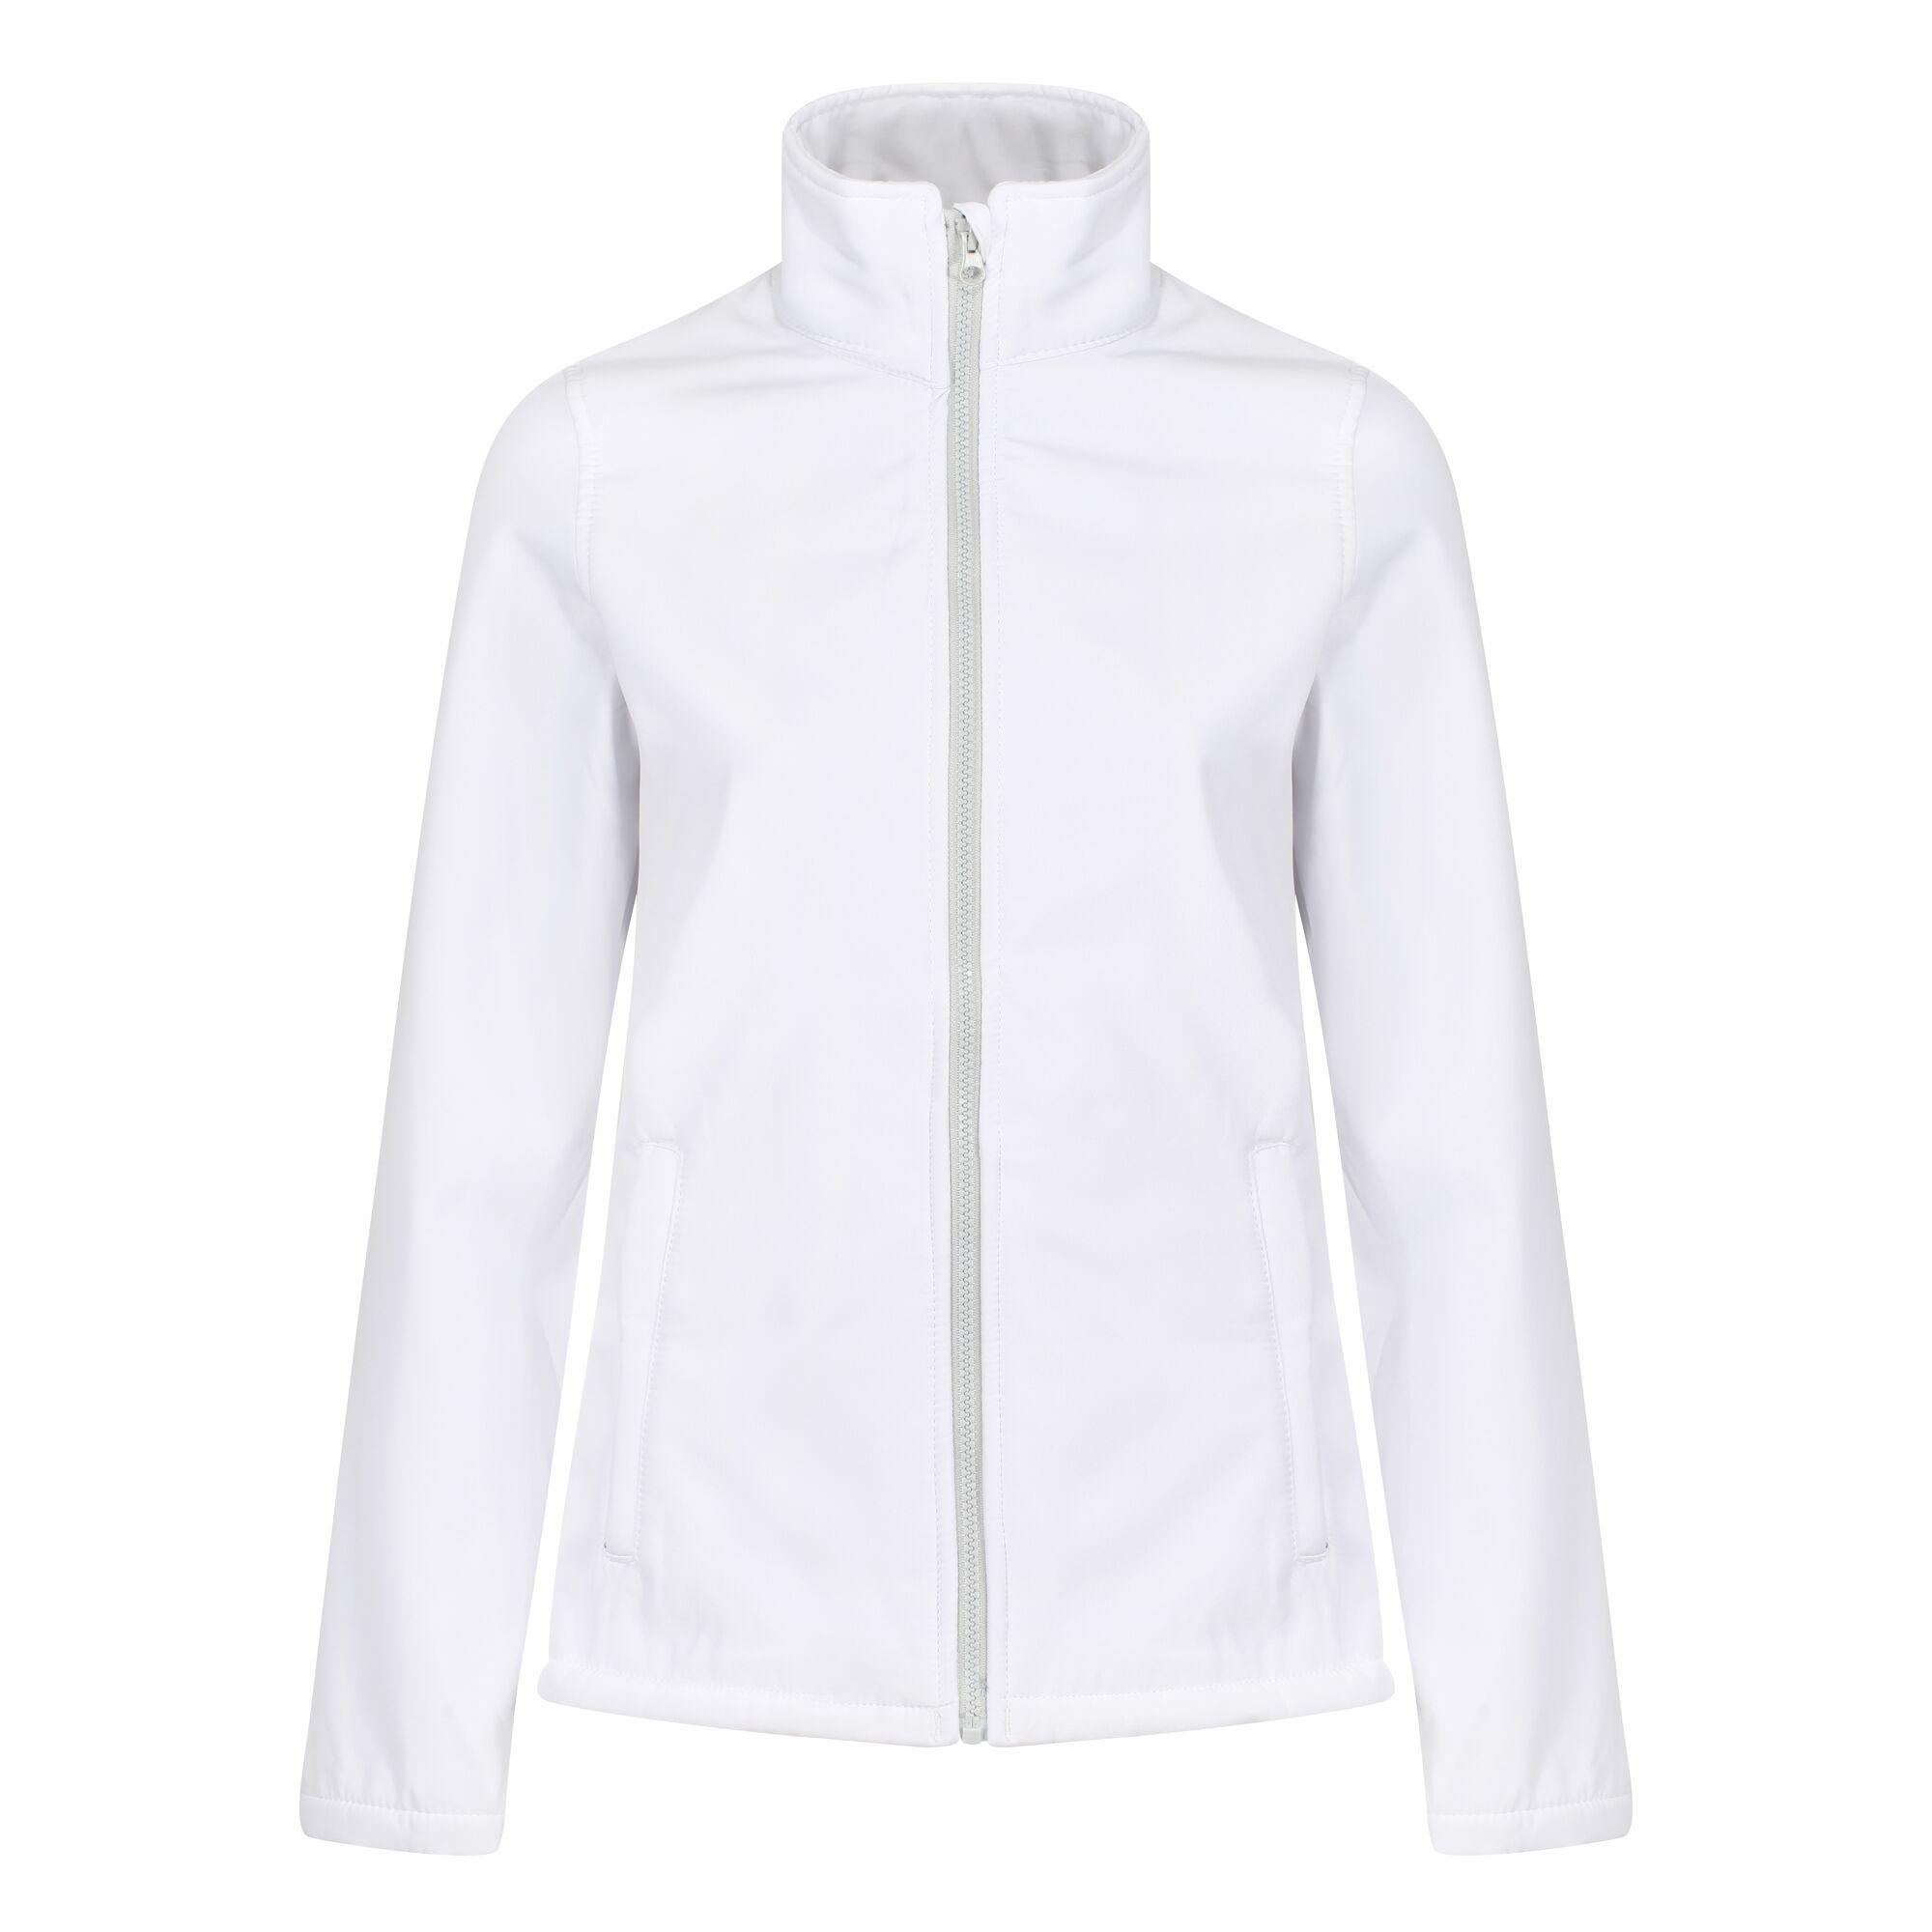 Regatta Standout Womens/Ladies Ablaze Printable Soft Shell Jacket (16) (Classic Red/Black)